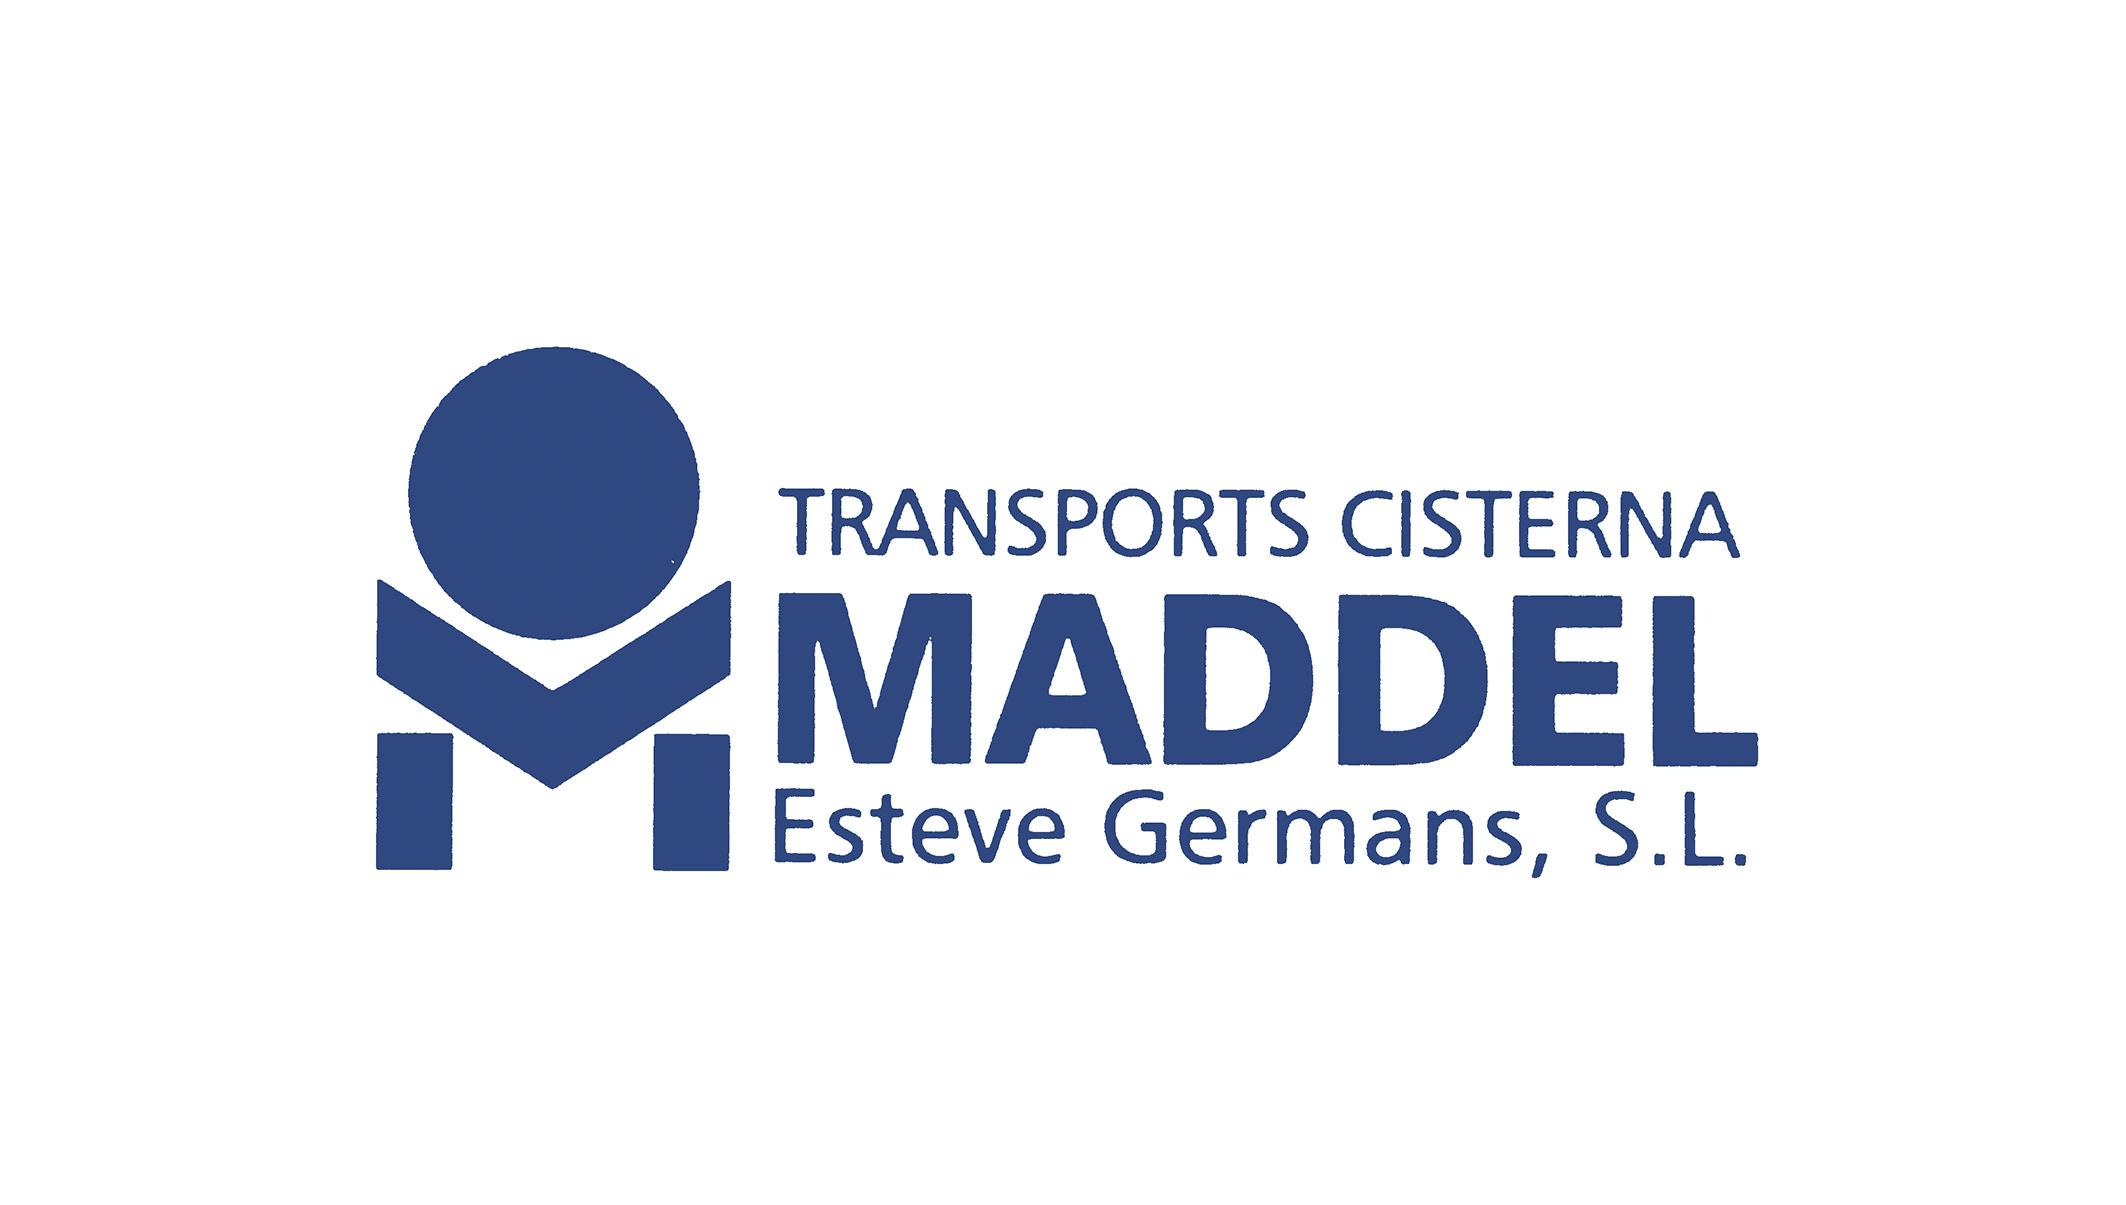 Maddel Transports